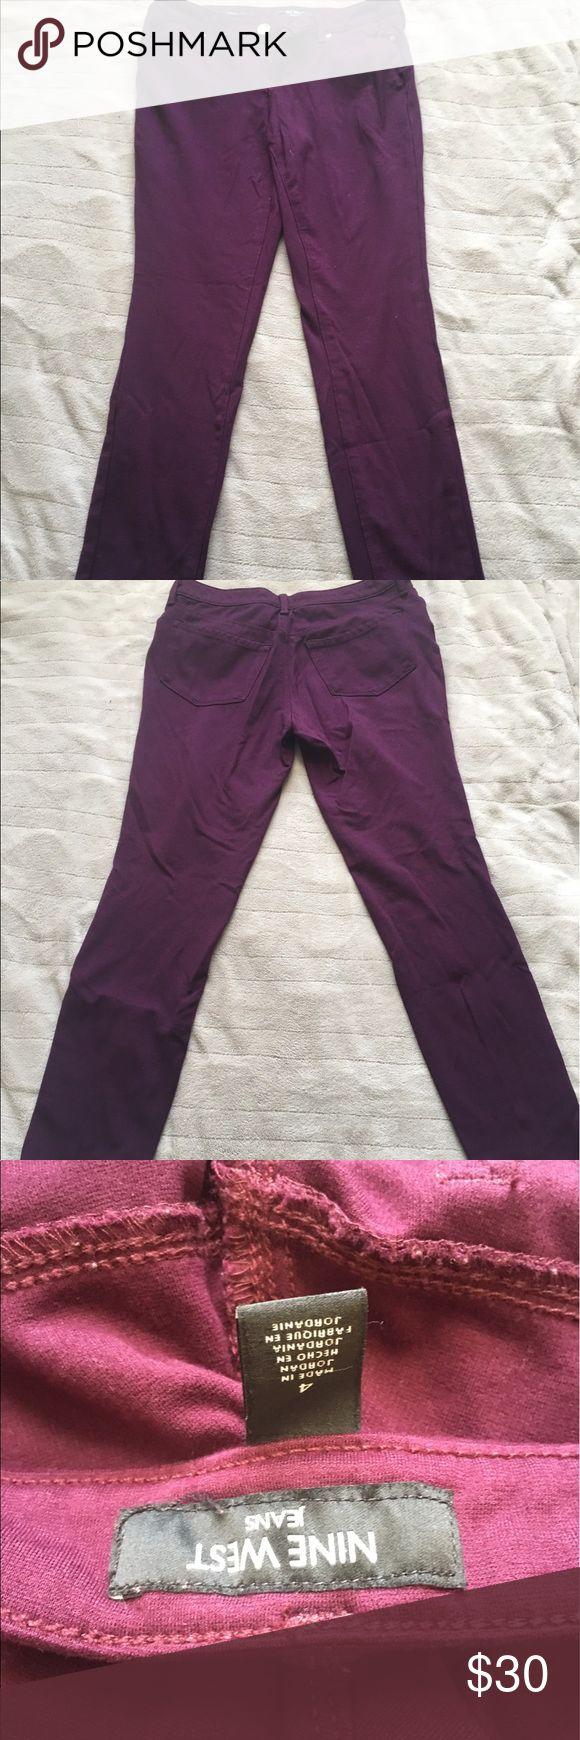 Nine West purple skinny jean. NWOT. Nine West purple skinny jean. Soft and comfy. PERFECT condition. Nine West Pants Skinny